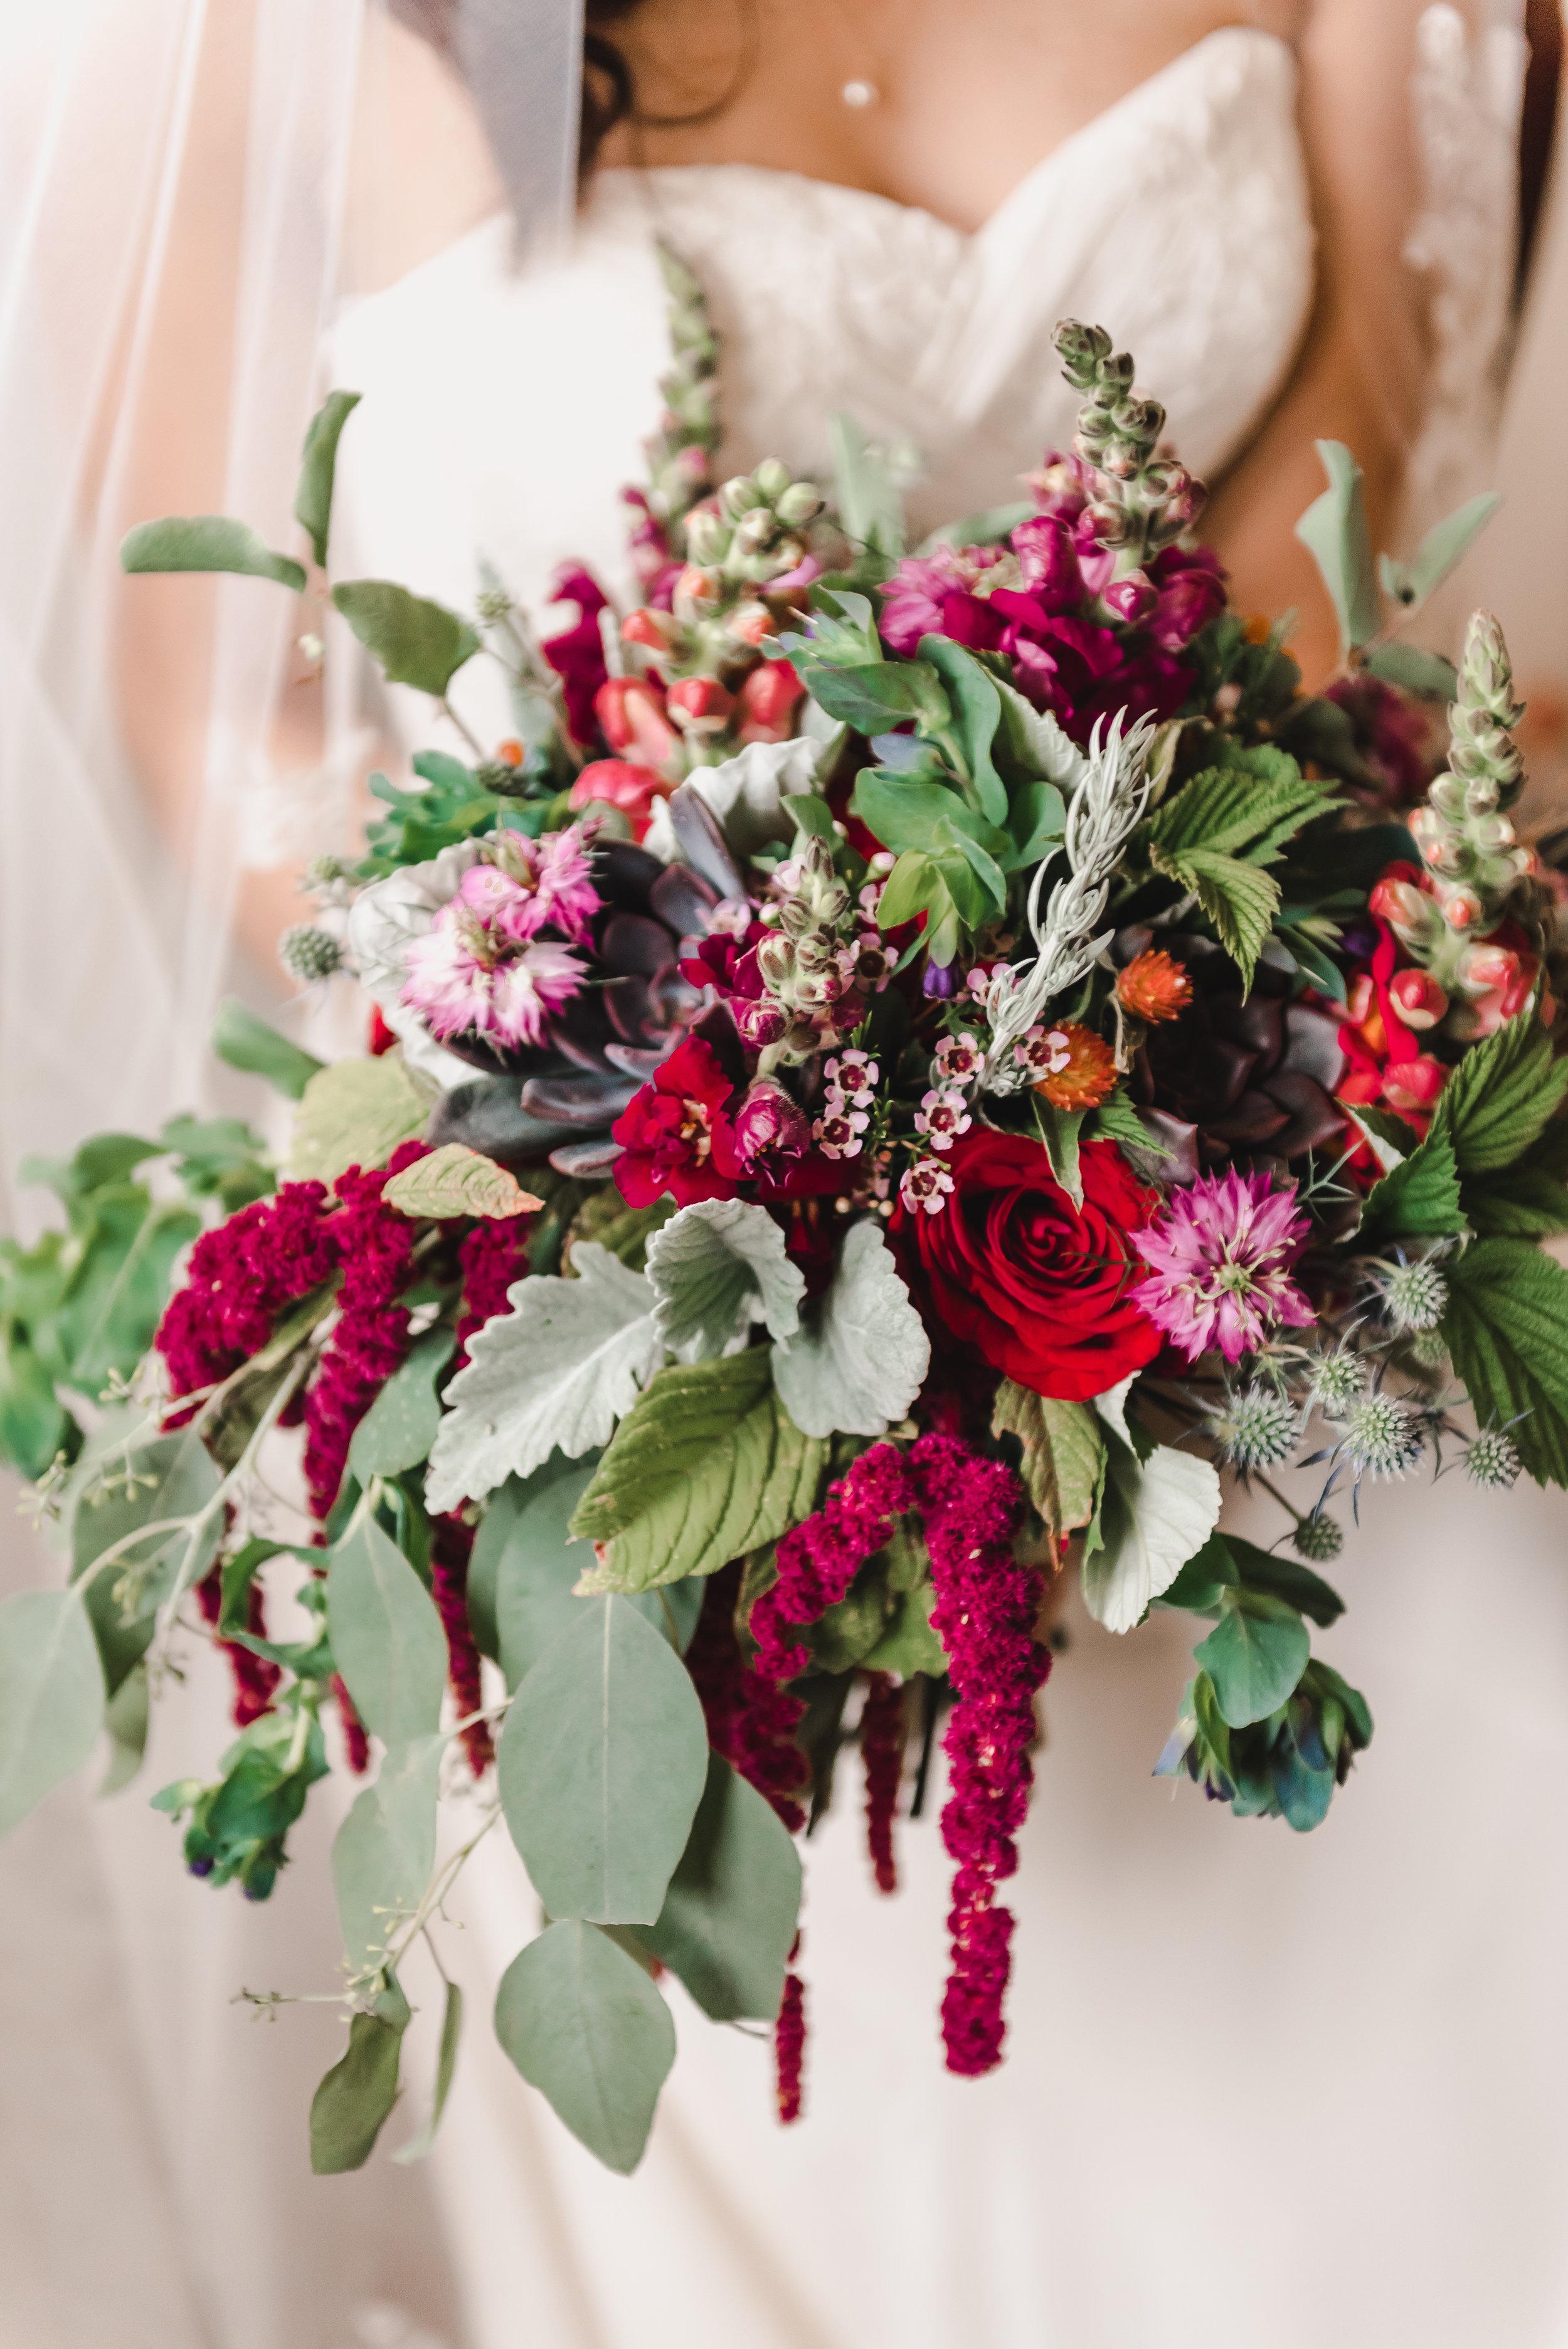 Oversized, Garden-Fresh Organic Wedding Bridal Bouquet from Lyons Farmette